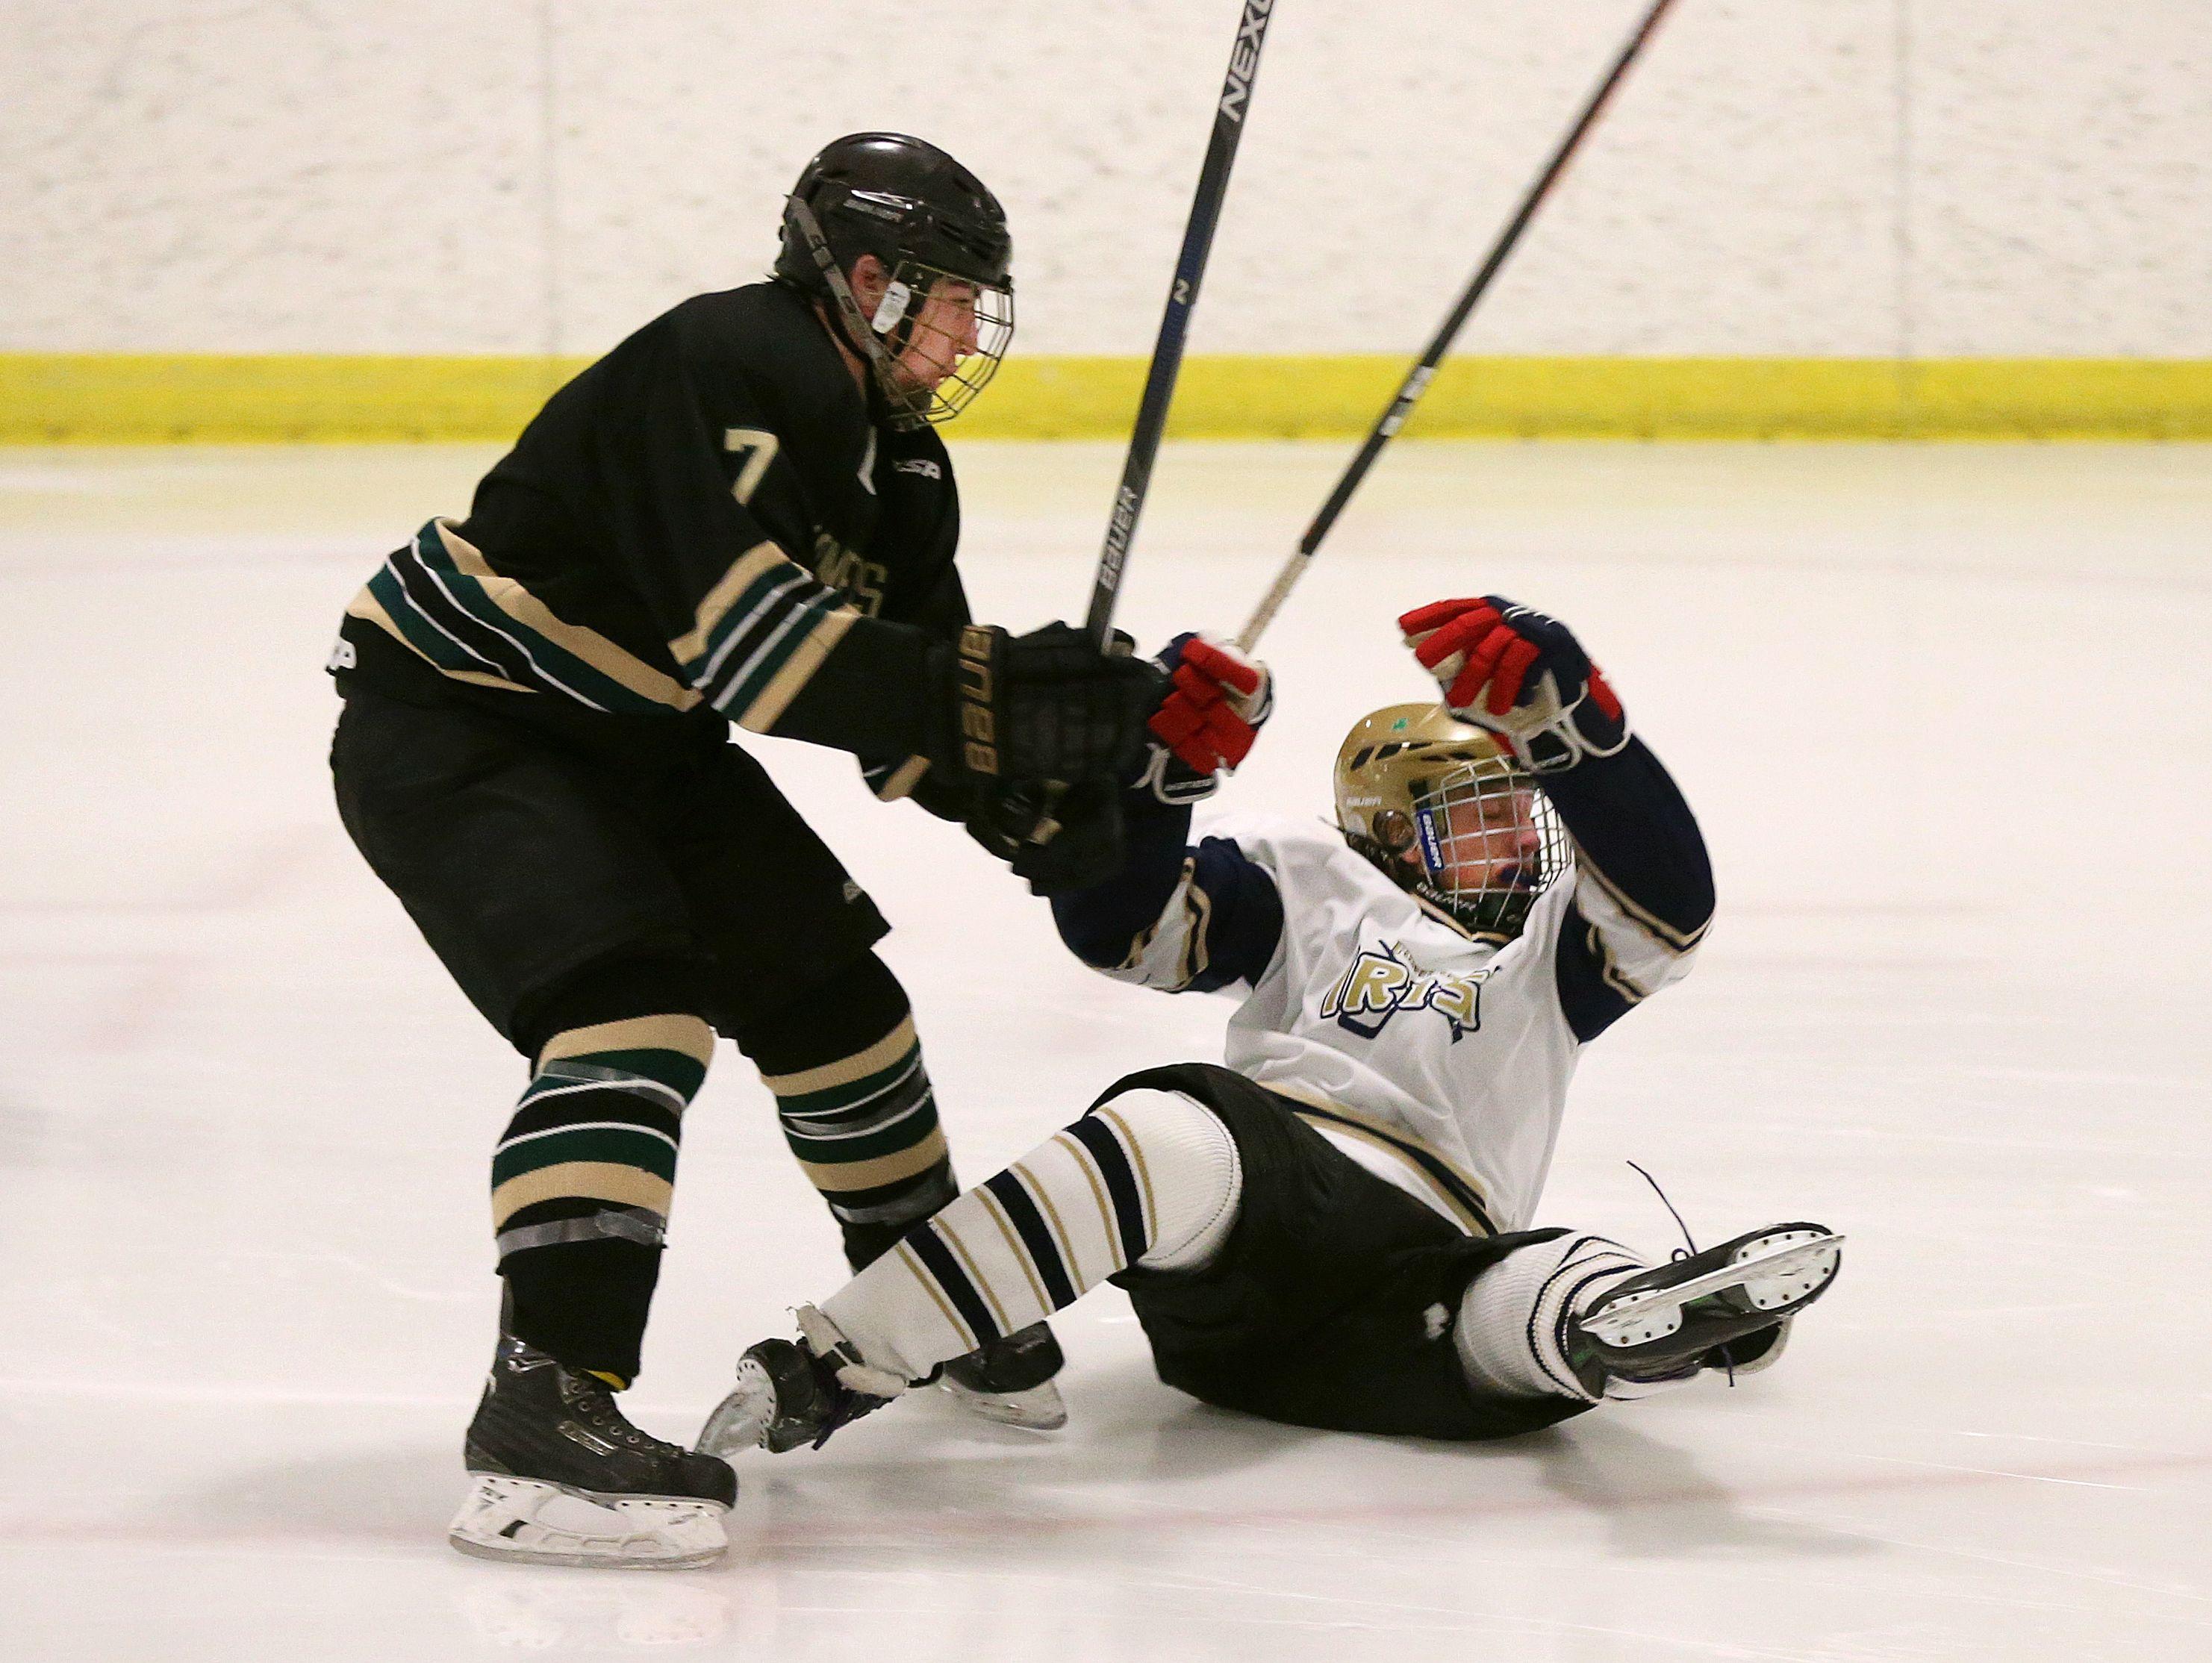 Batavia Notre Dame's Cameron Clark gets checked to the ice by Rush-Henrietta's Keegan White (7).